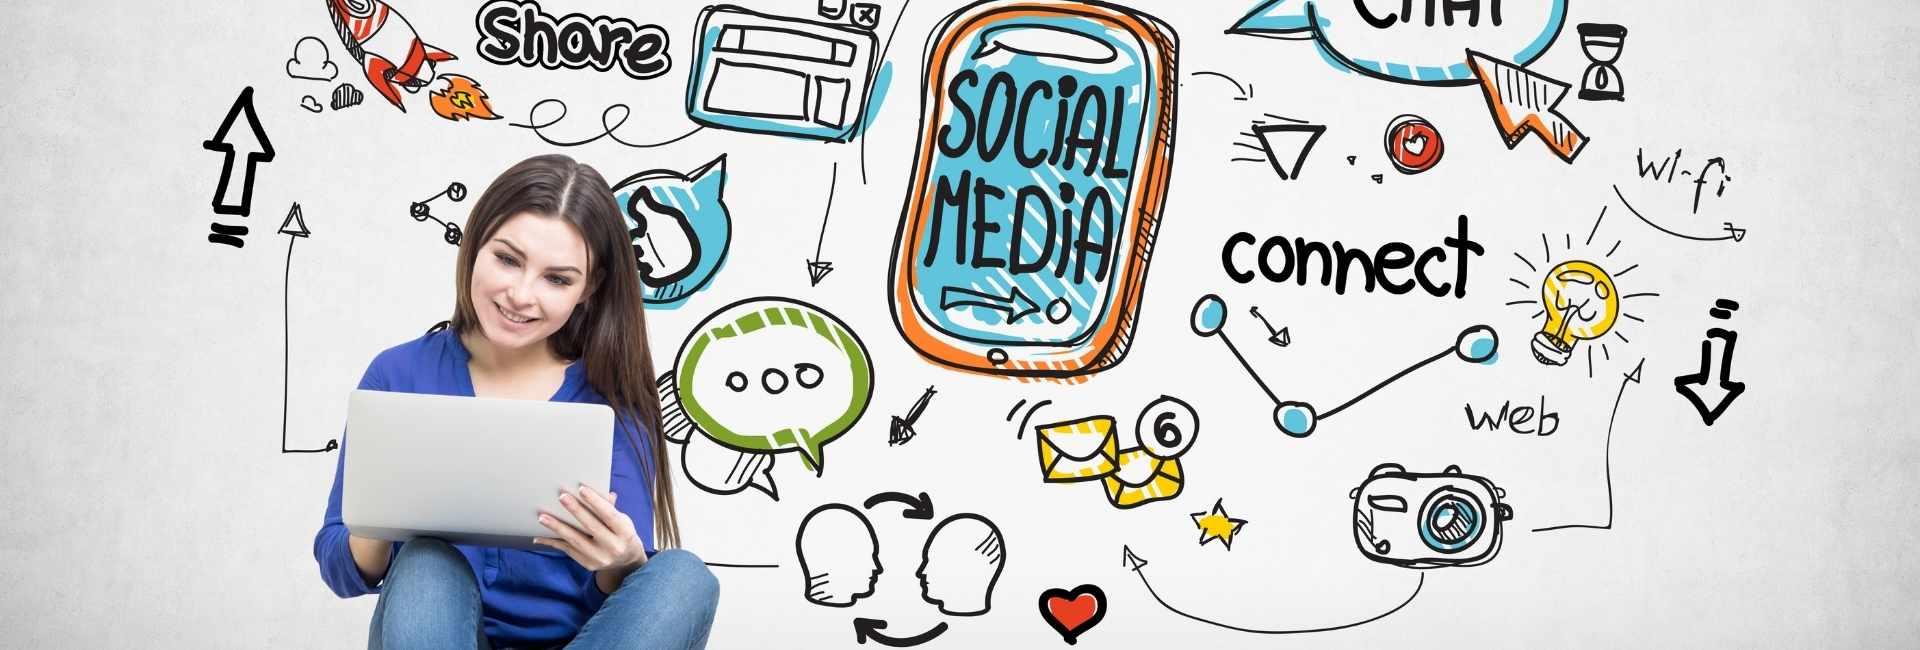 Best Social Media Marketing Expert in Kerala..